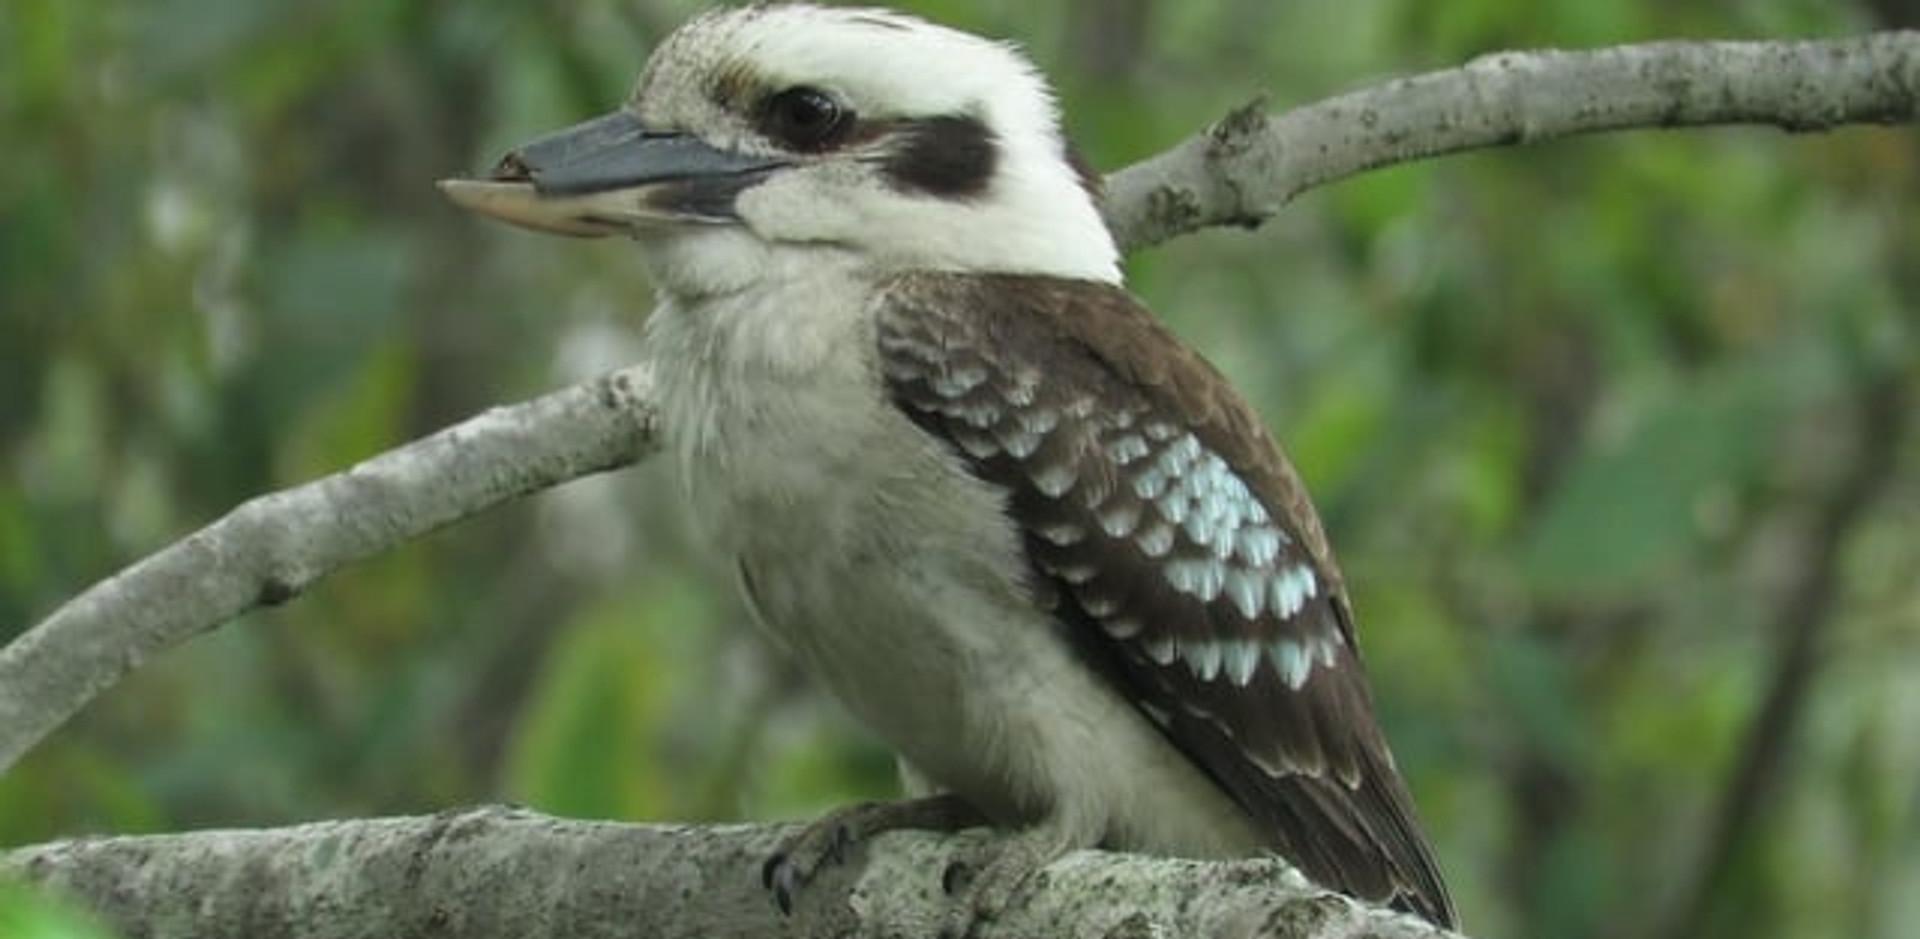 Adult Laughing Kookaburra with damaged beak